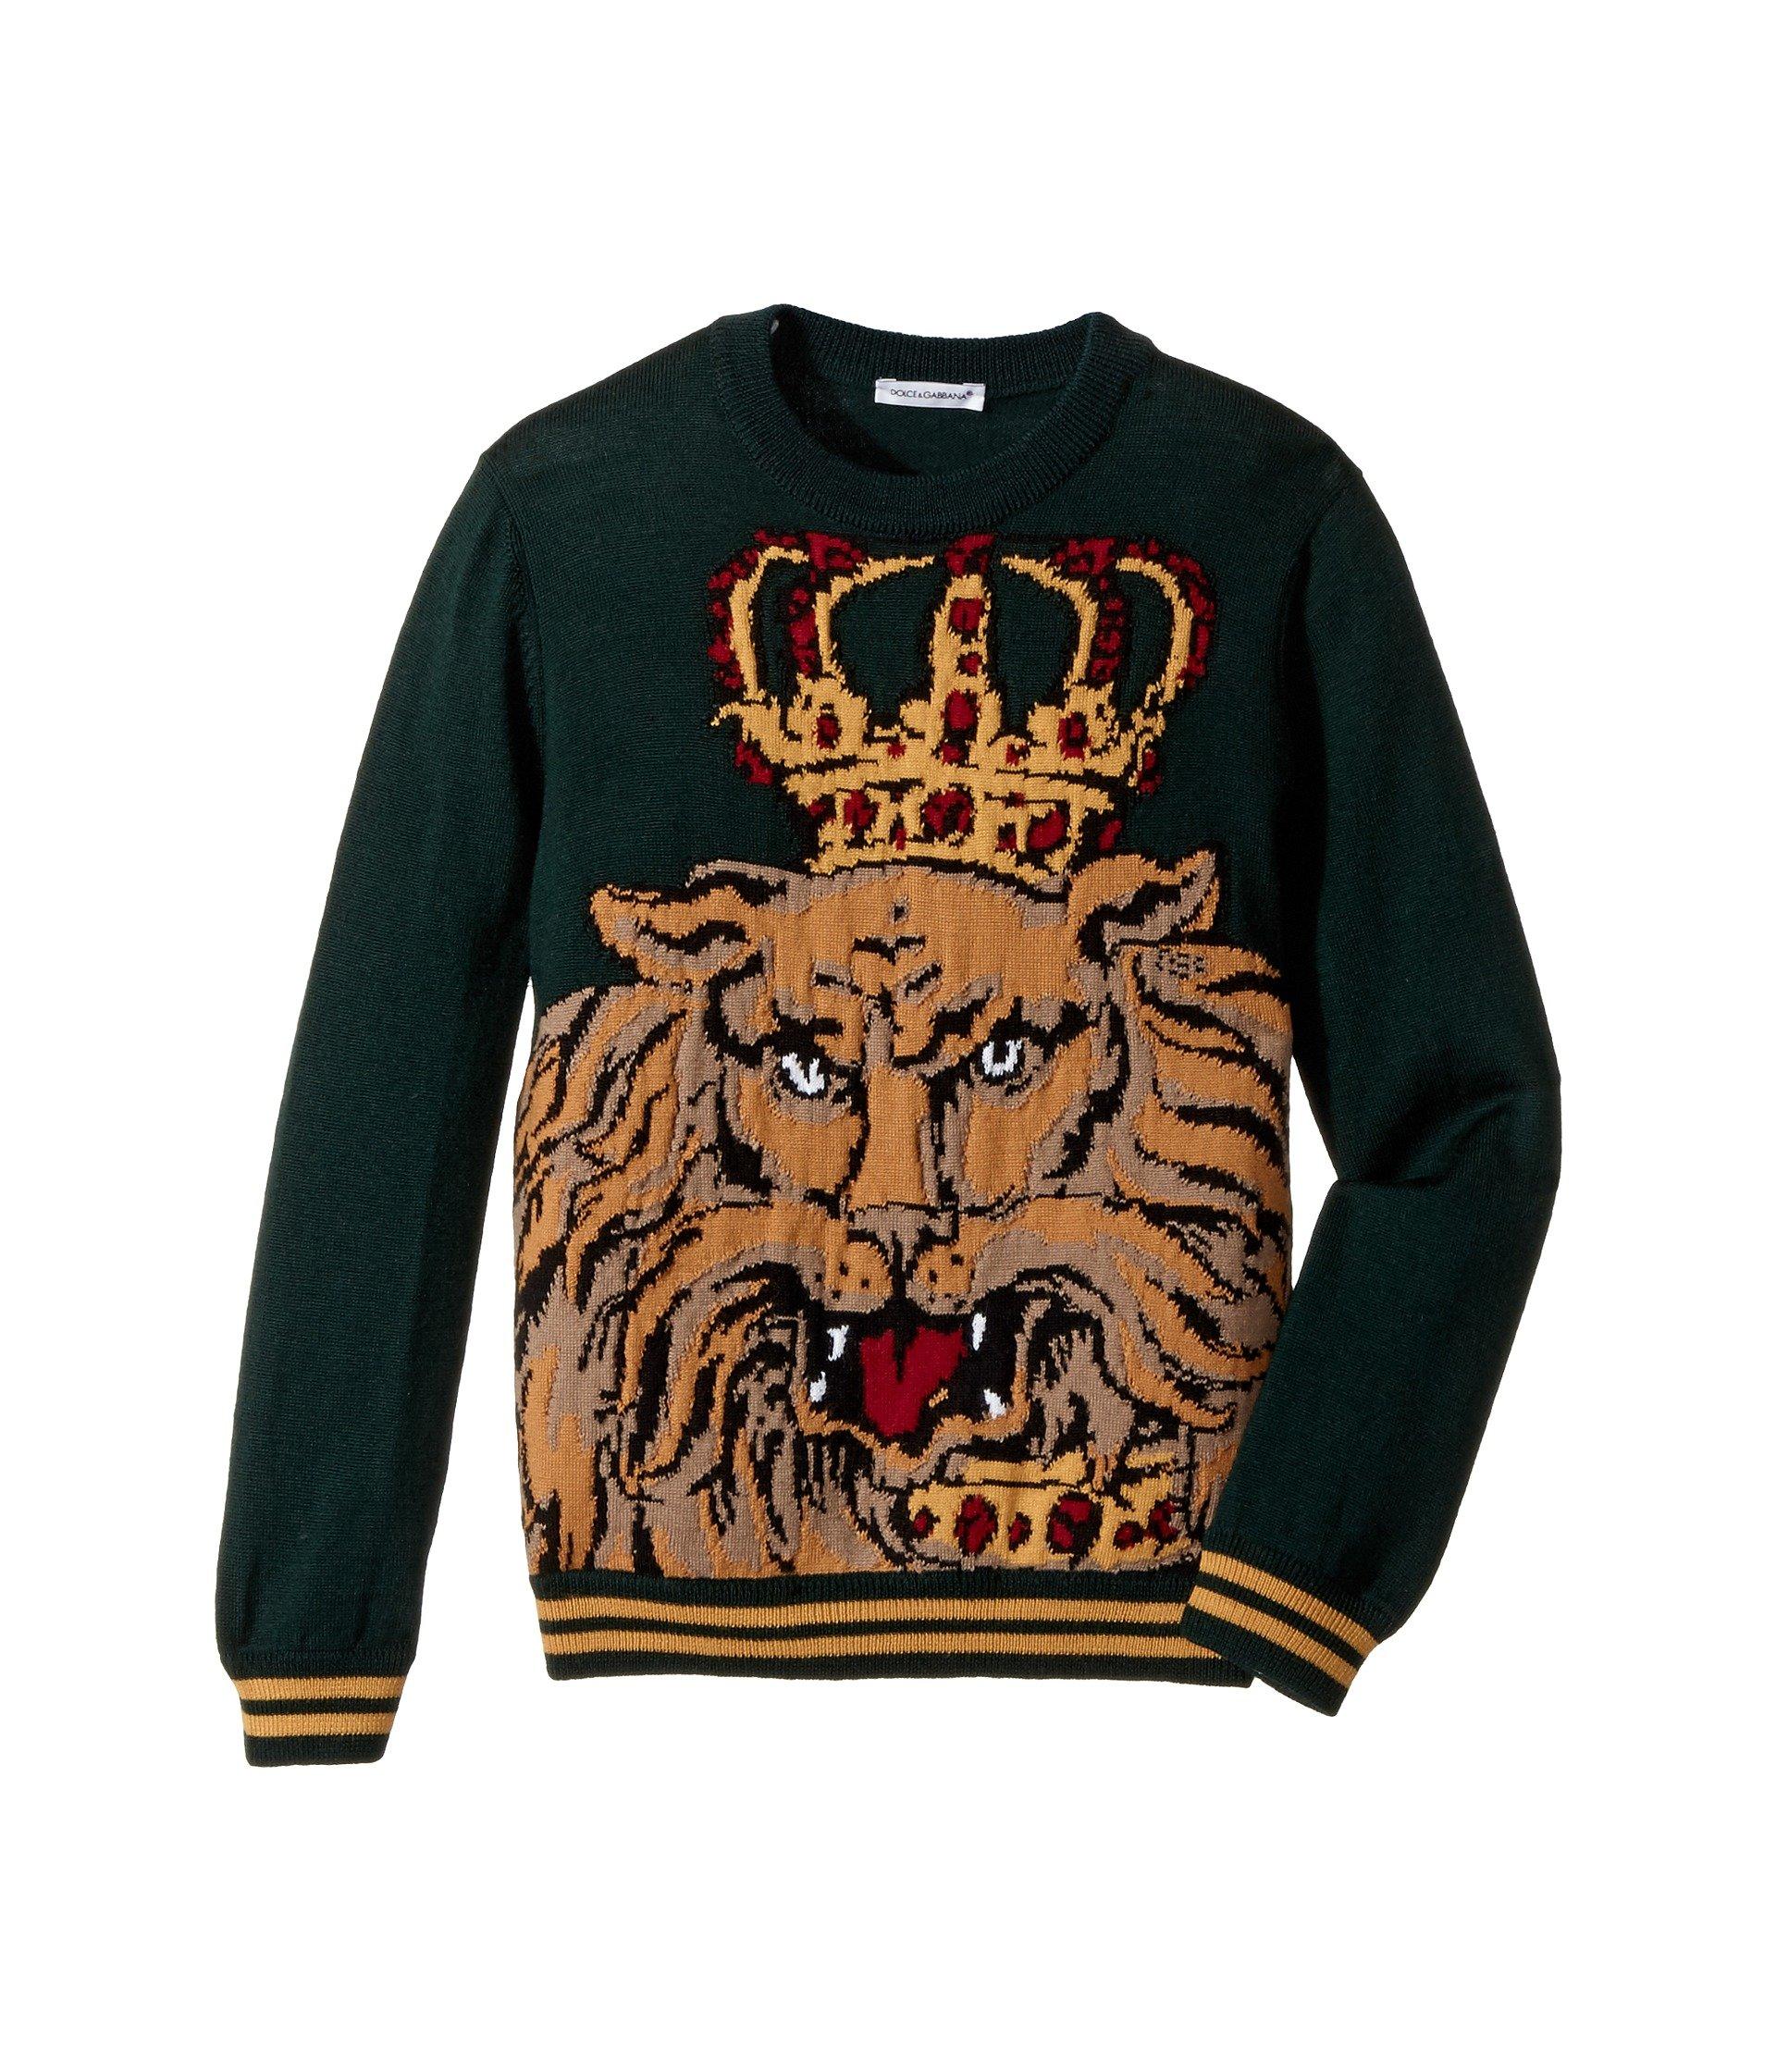 Buzo para Niño Dolce and Gabbana Kids Lion King Sweater (Toddler/Little Kids)  + Dolce & Gabbana en VeoyCompro.net